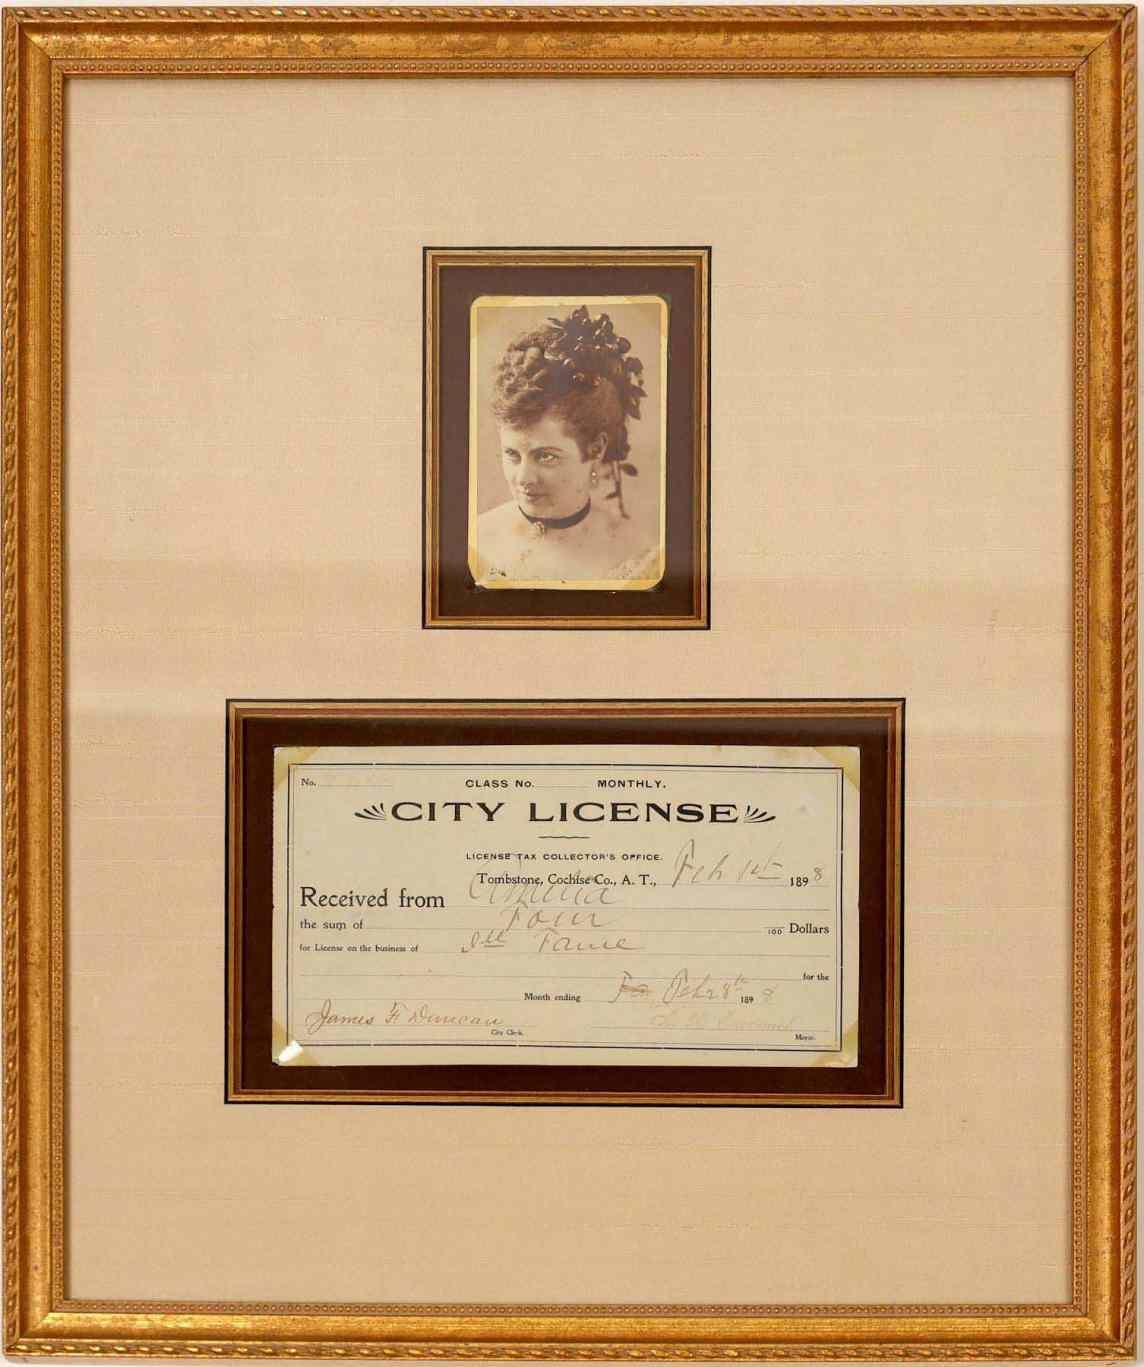 1898 Arizona prostitute license with photo, framed